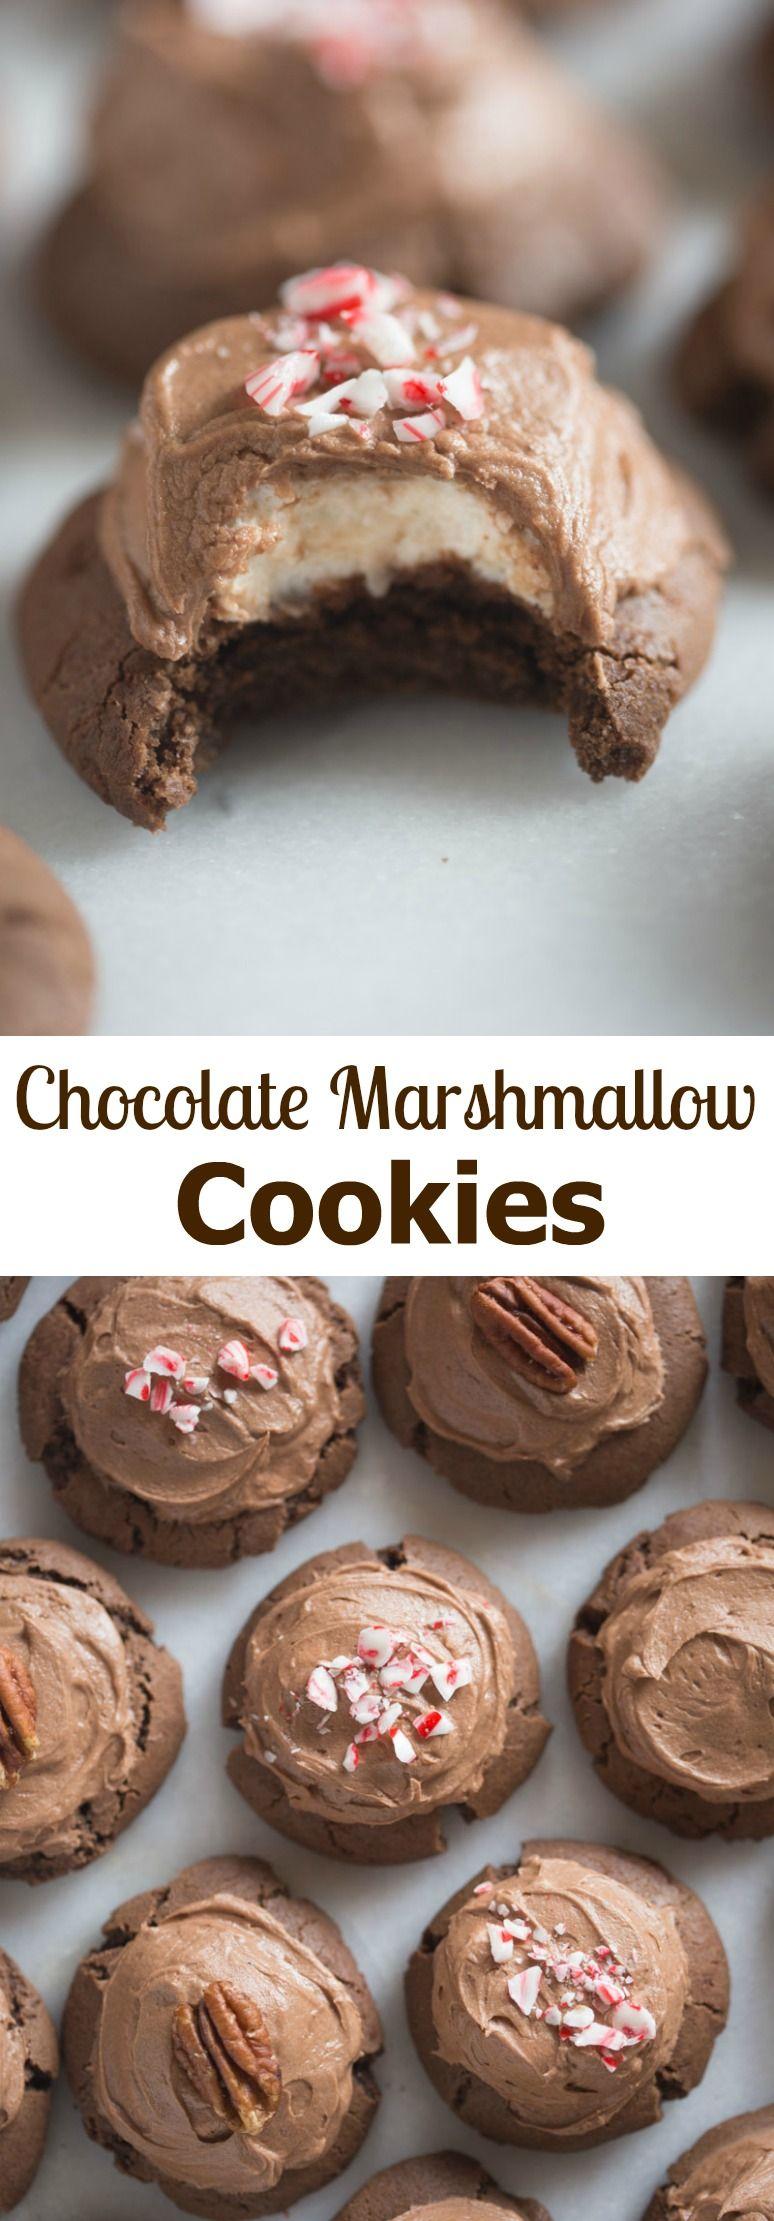 Chocolate Marshmallow Cookies #chocolatemarshmallowcookies